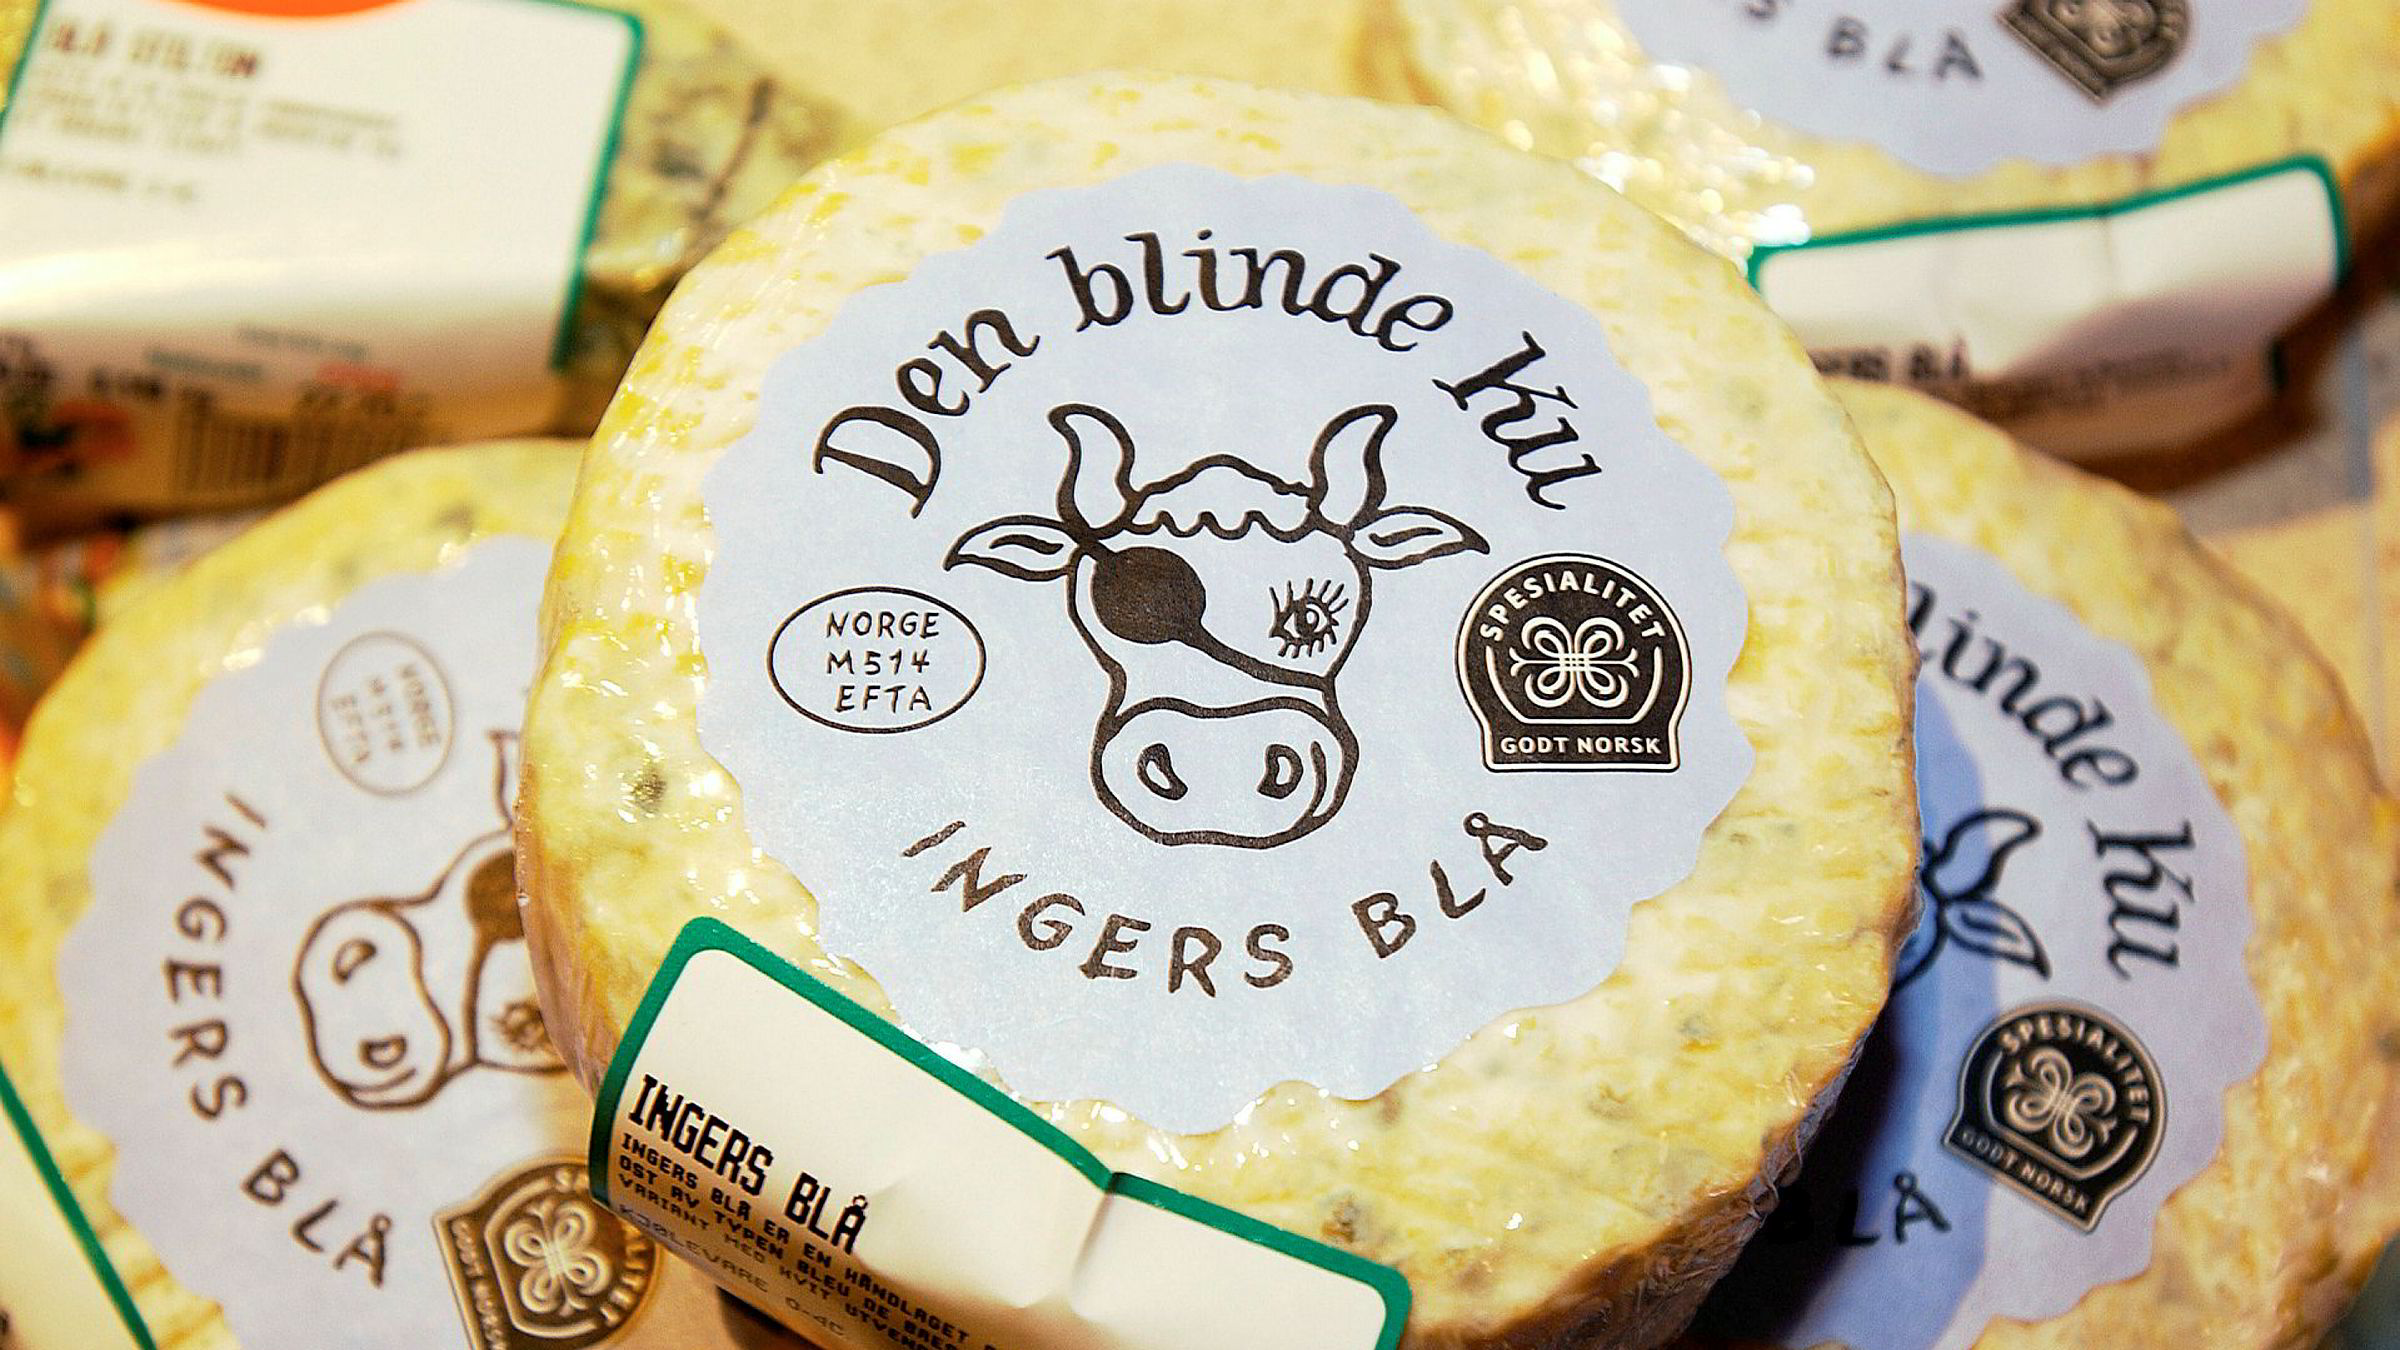 Osteprodusenten Den Blinde Ku har vunnet mange priser for sine oster.